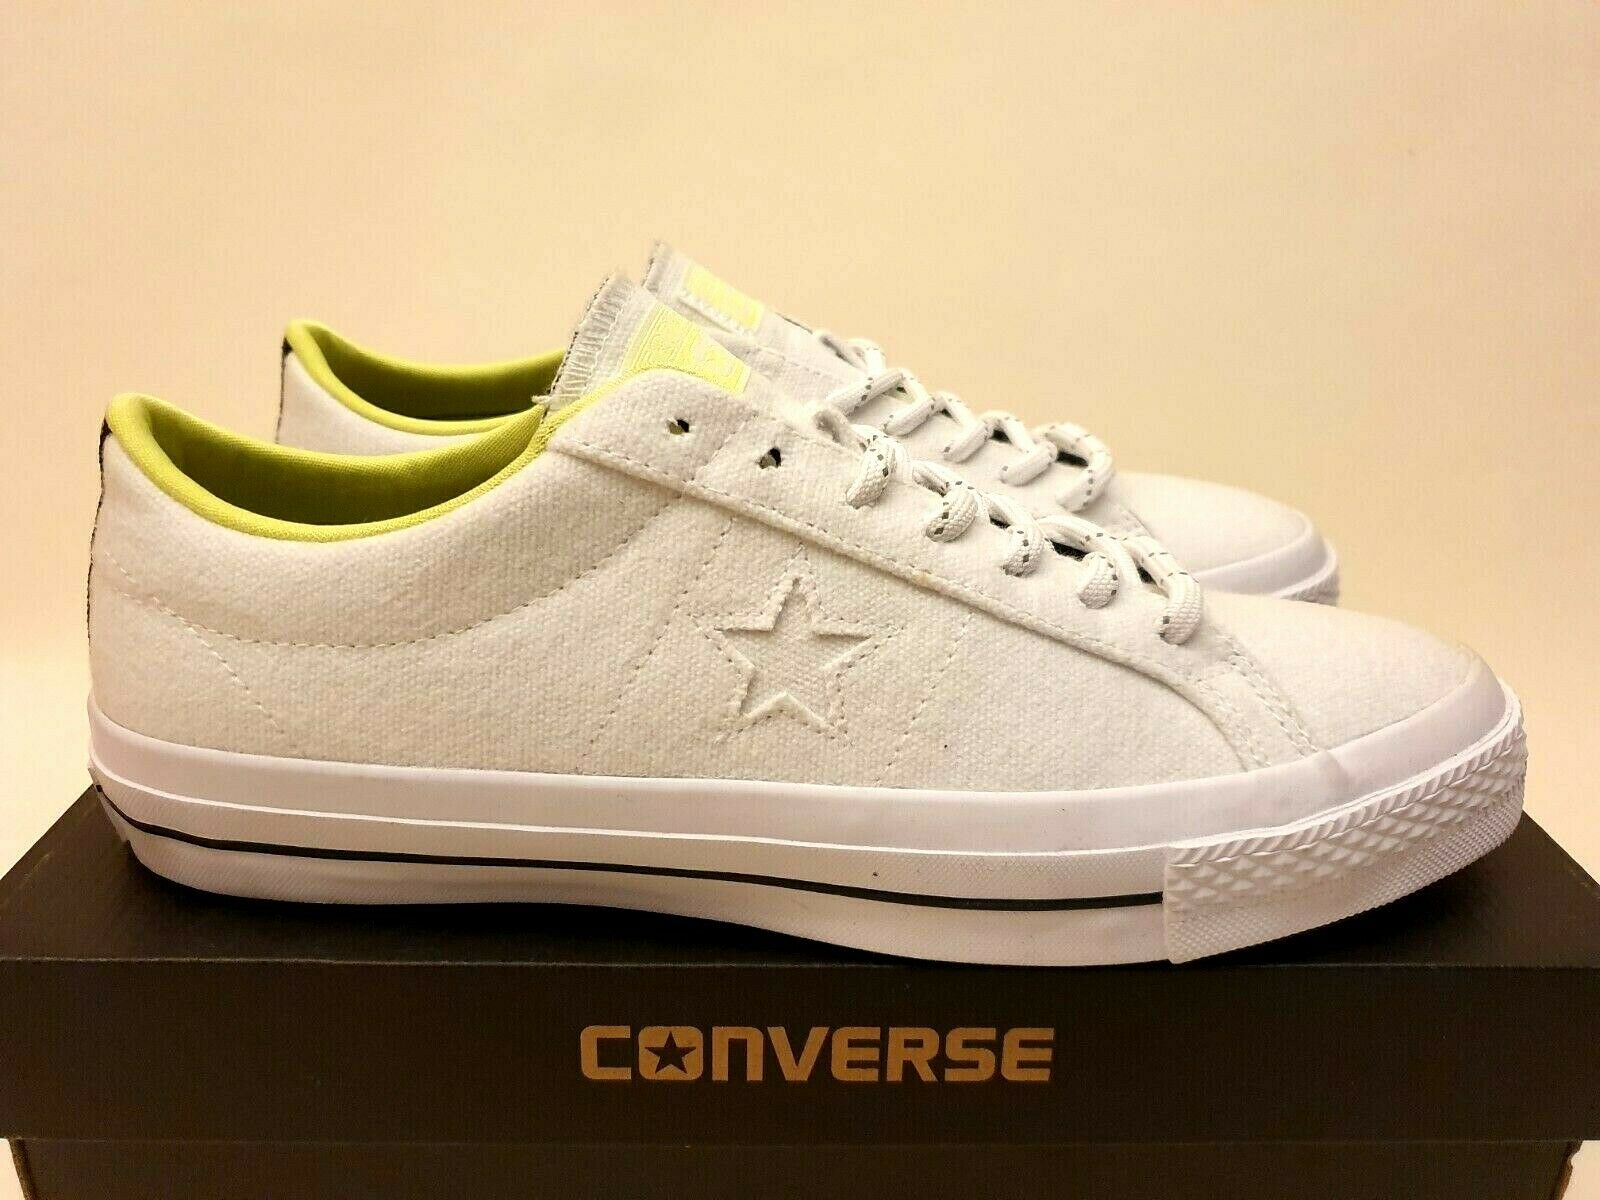 Converse One Star Shield Canvas OX